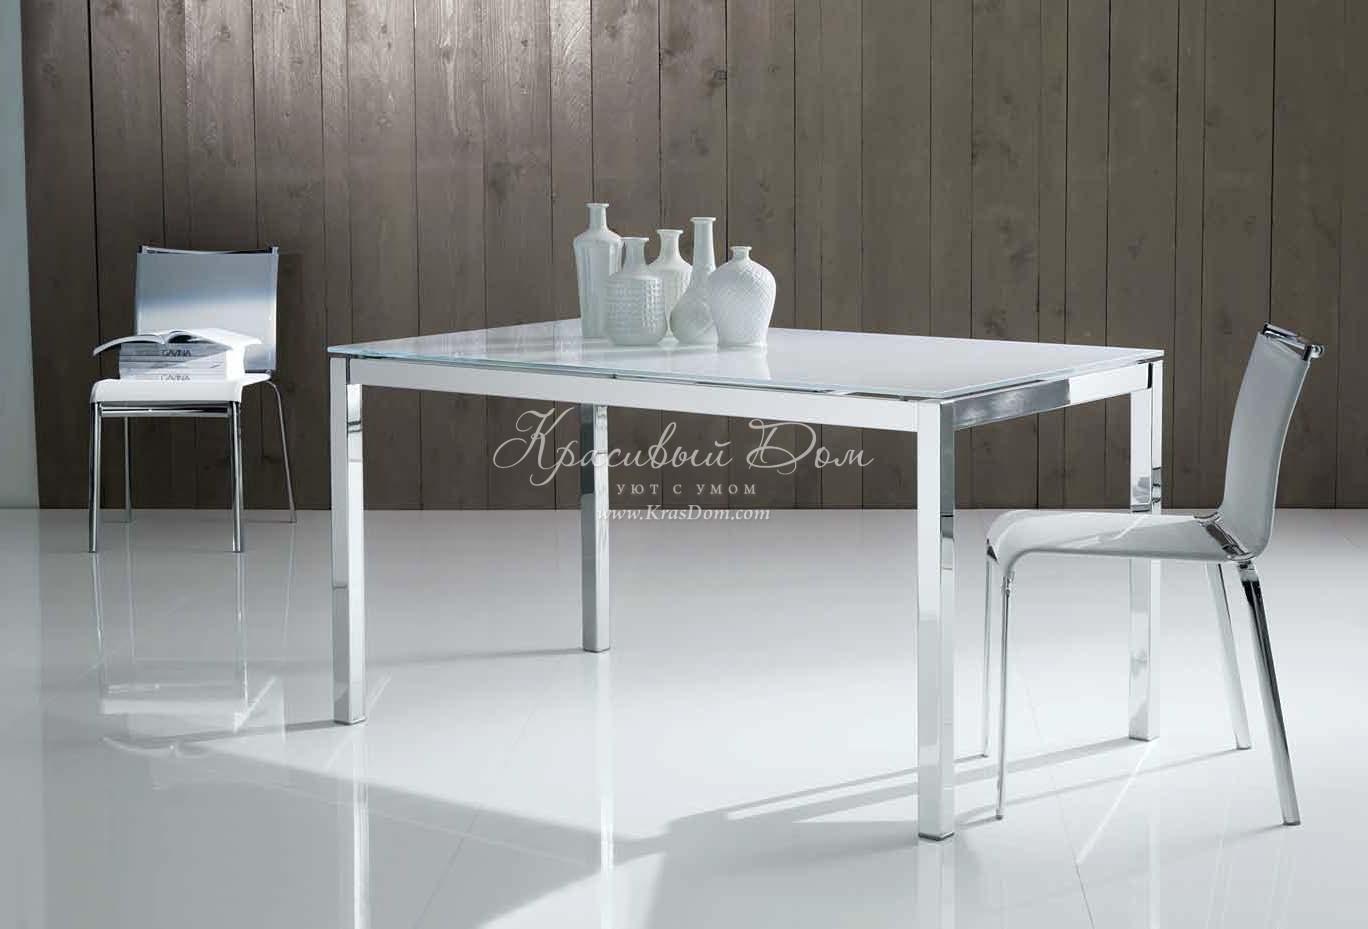 стол обеденный Mbnt023 стеклянный обеденный стол на